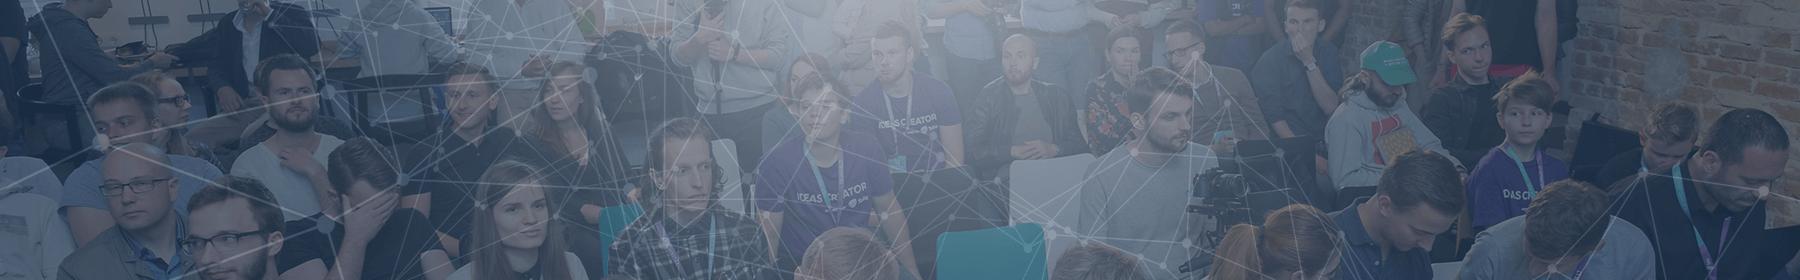 Vilnius Tech Park membership plans